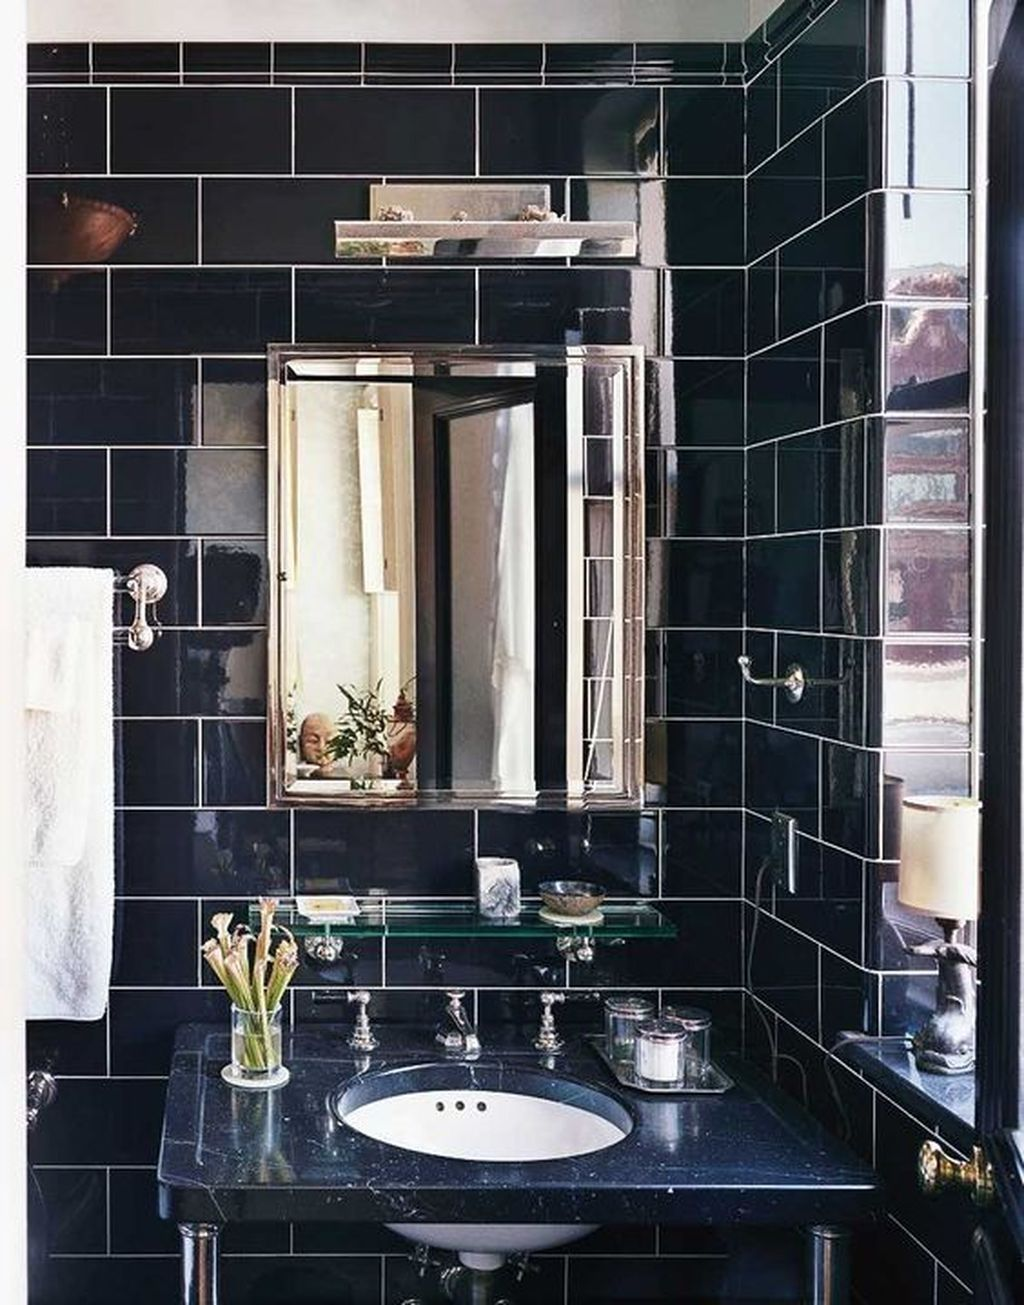 Nice 37 Modern Apartment Bathroom Designs Ideas For Men More At Https Homyfeed Com 2019 03 24 Apartment Bathroom Design Bathroom Design Traditional Bathroom